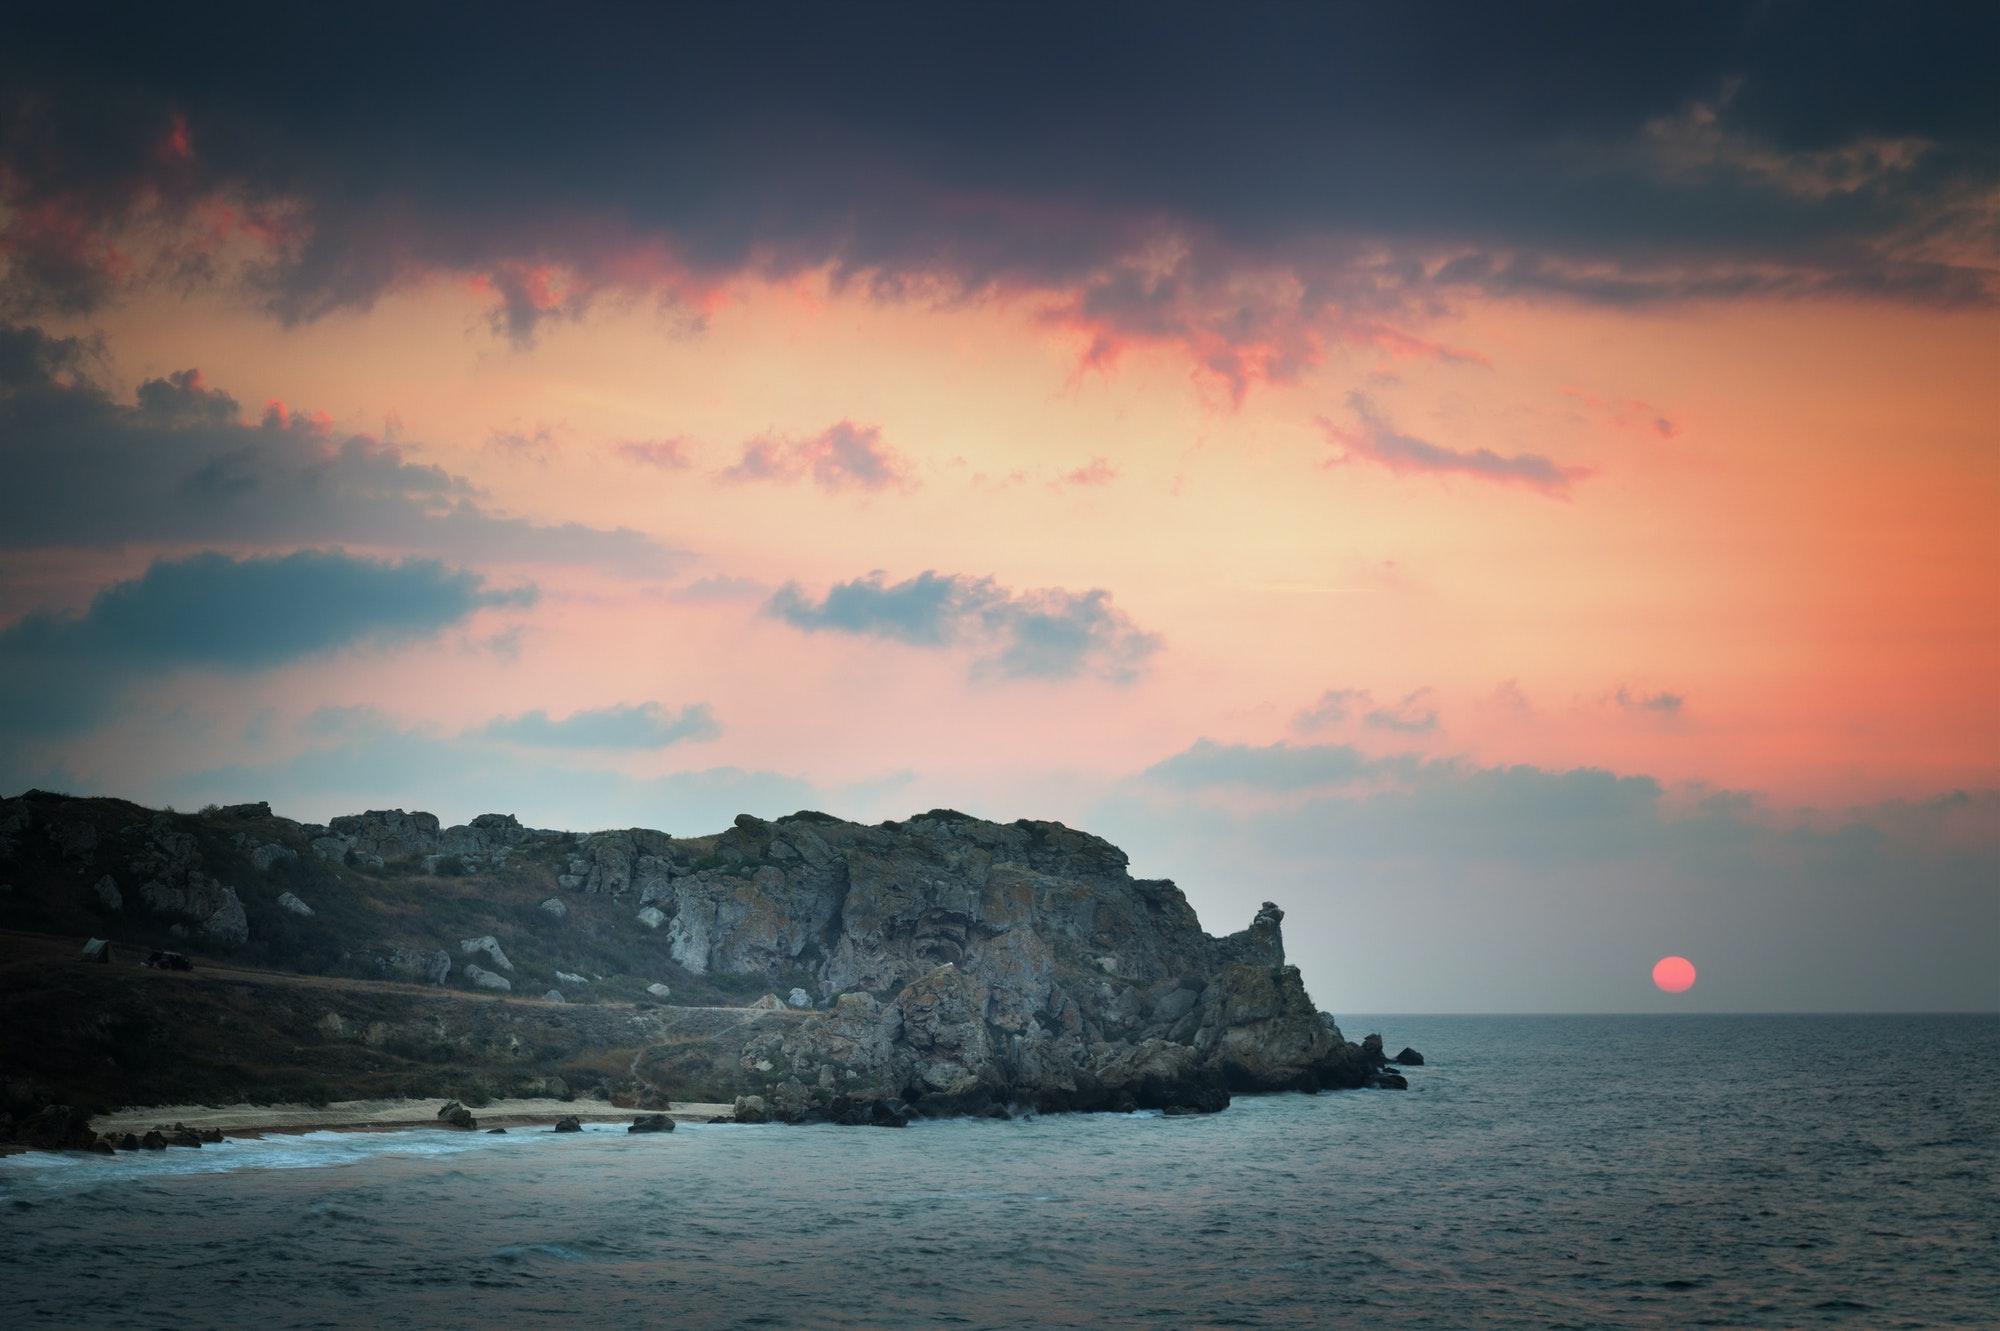 A day at fly fishing the seaeashore at sunset